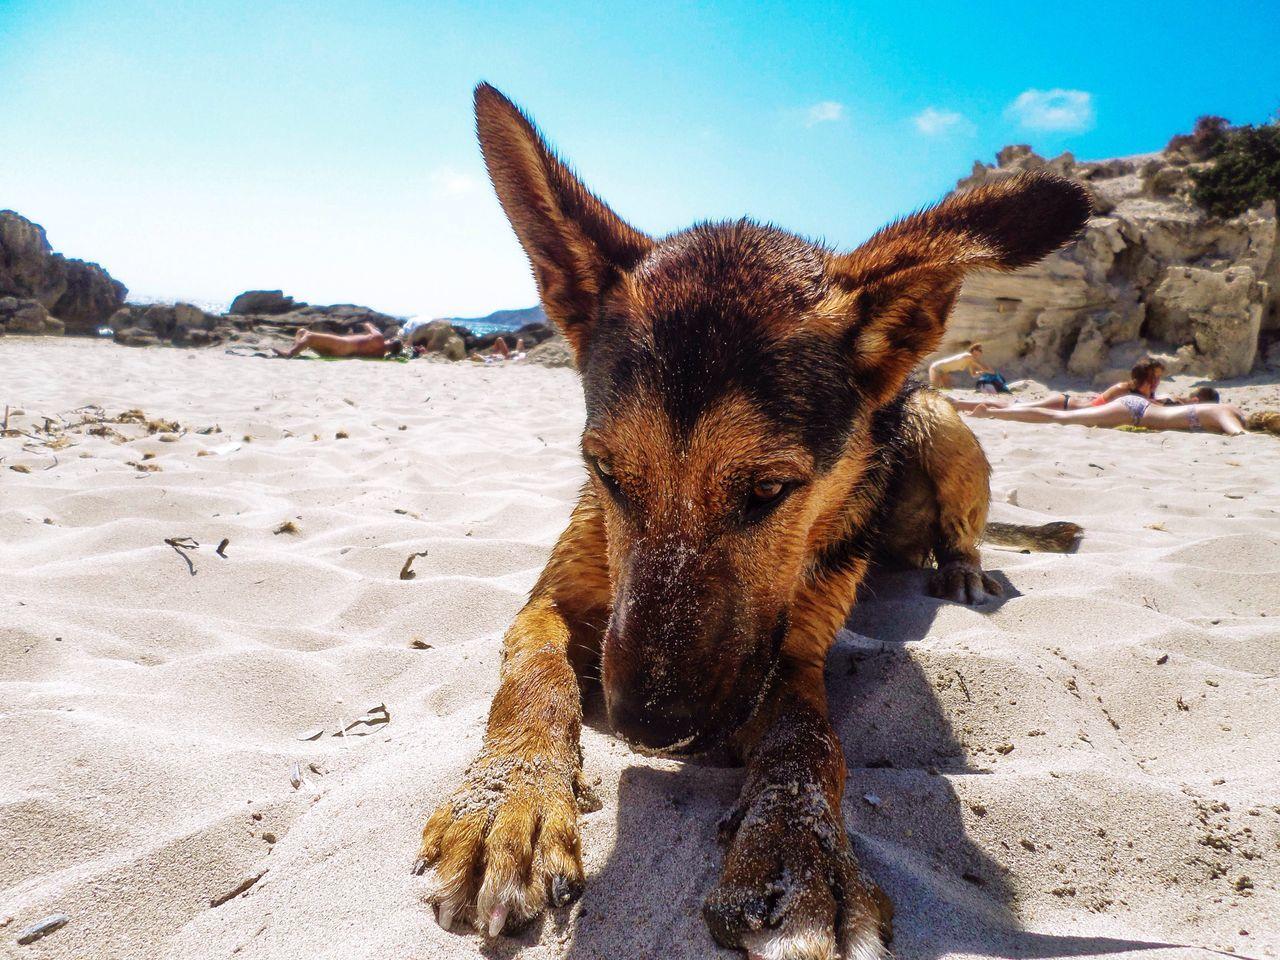 Dog Relaxing On Beach Against Sky